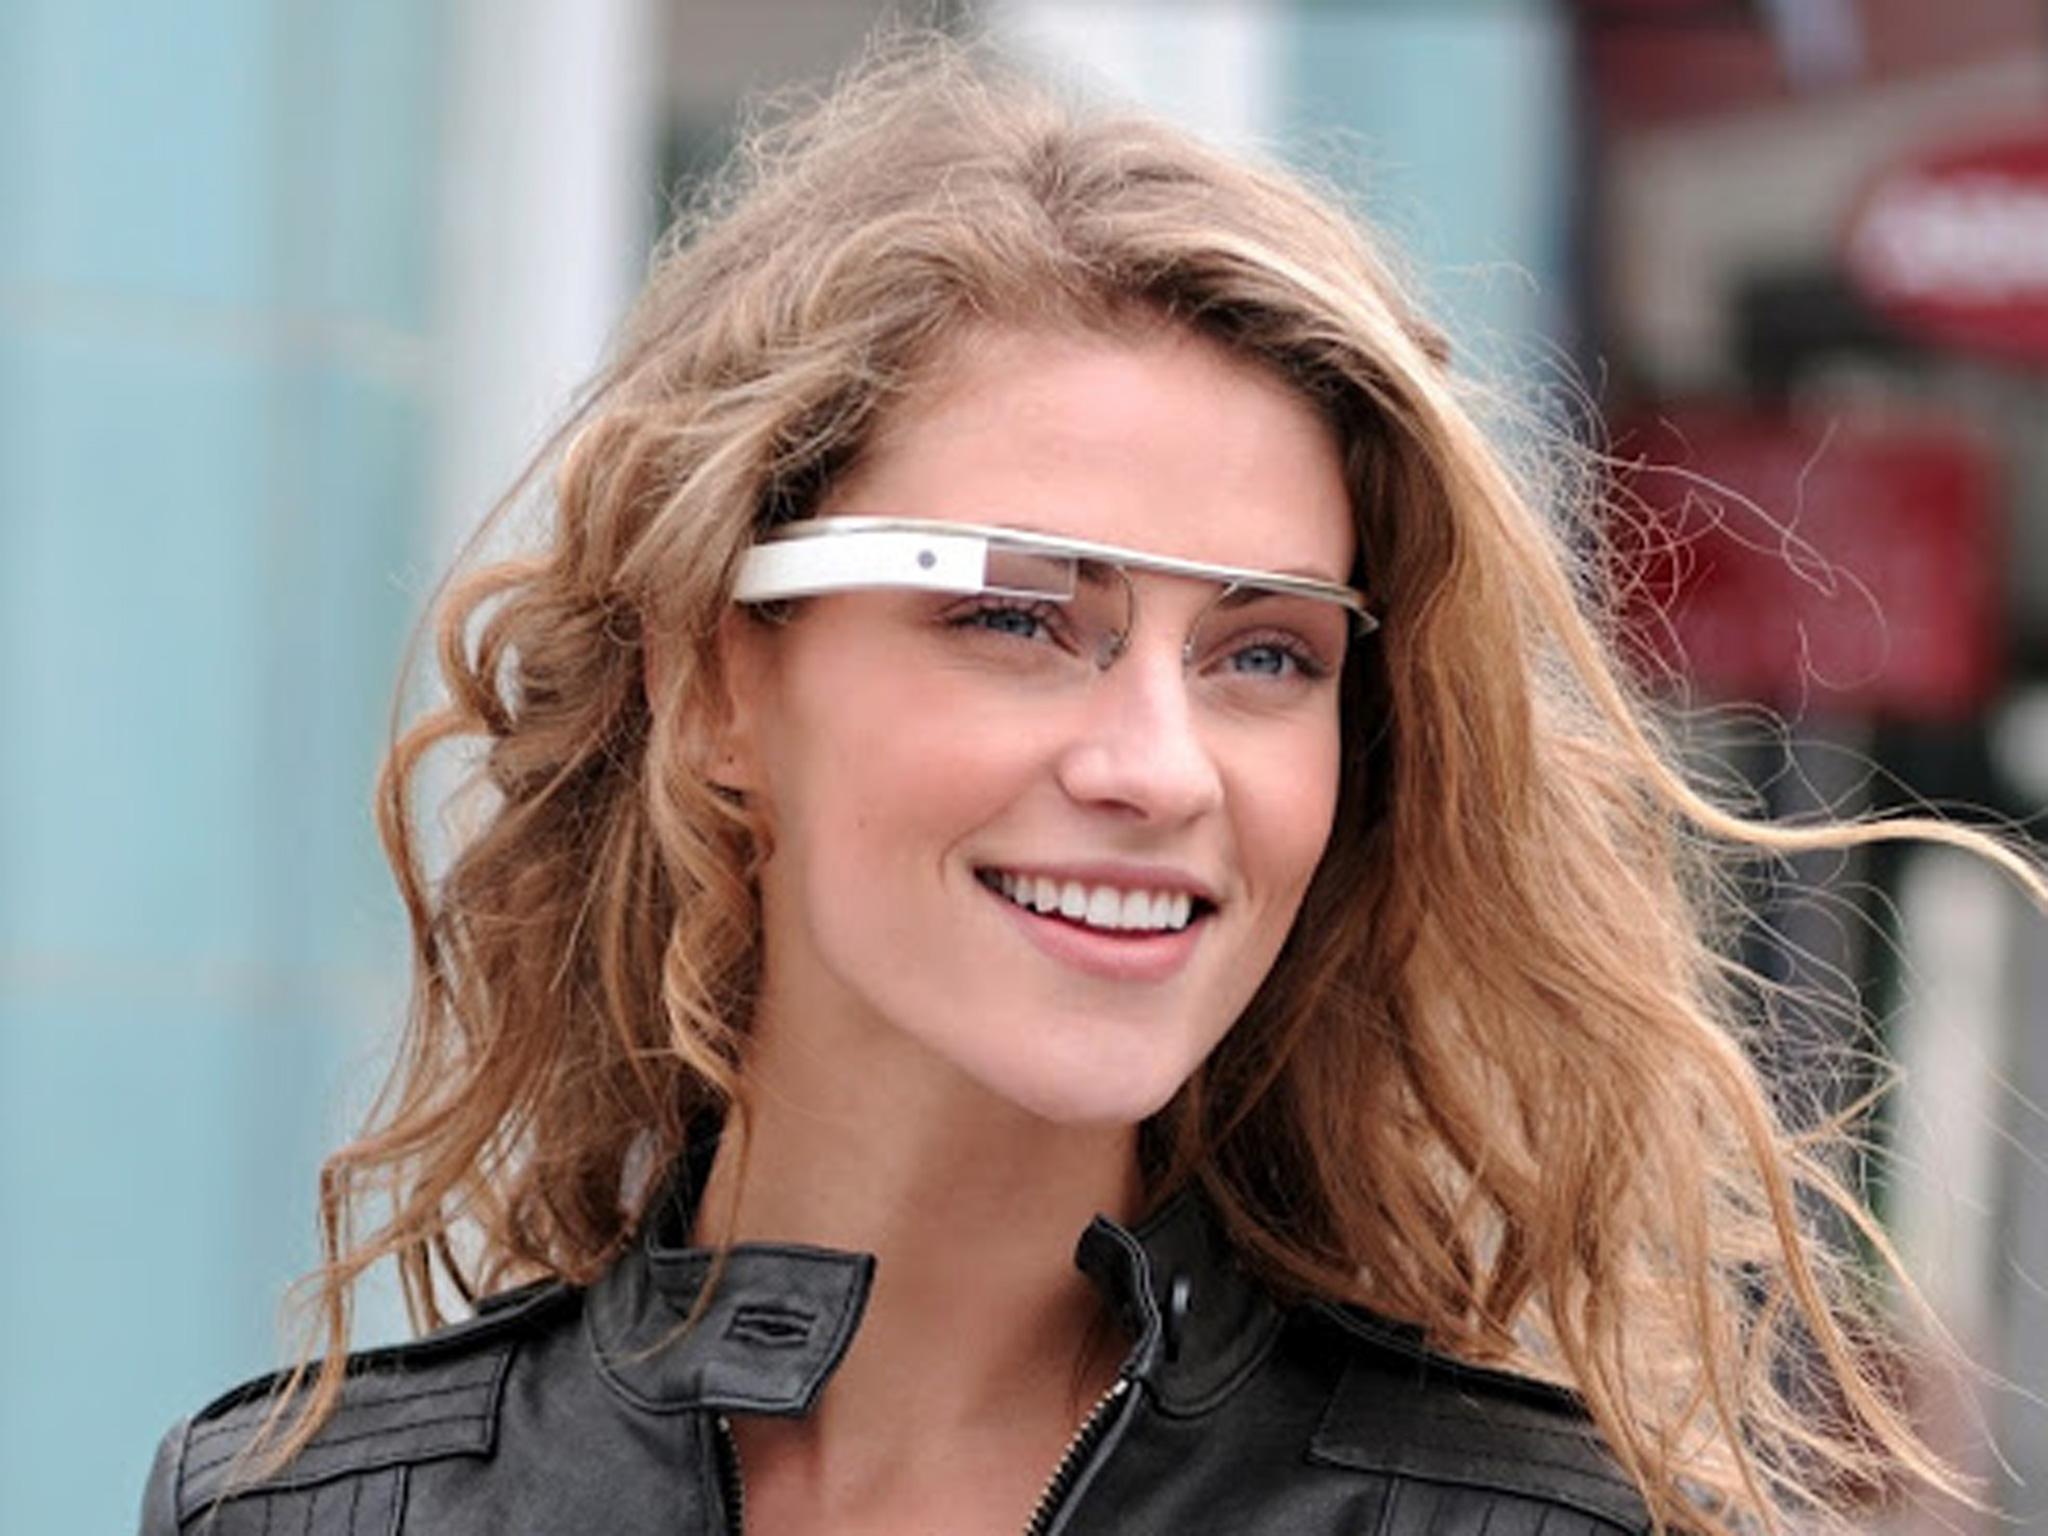 Gadget indossabili: Cook prevede che Google Glass sarà di nicchia, il polso è più naturale